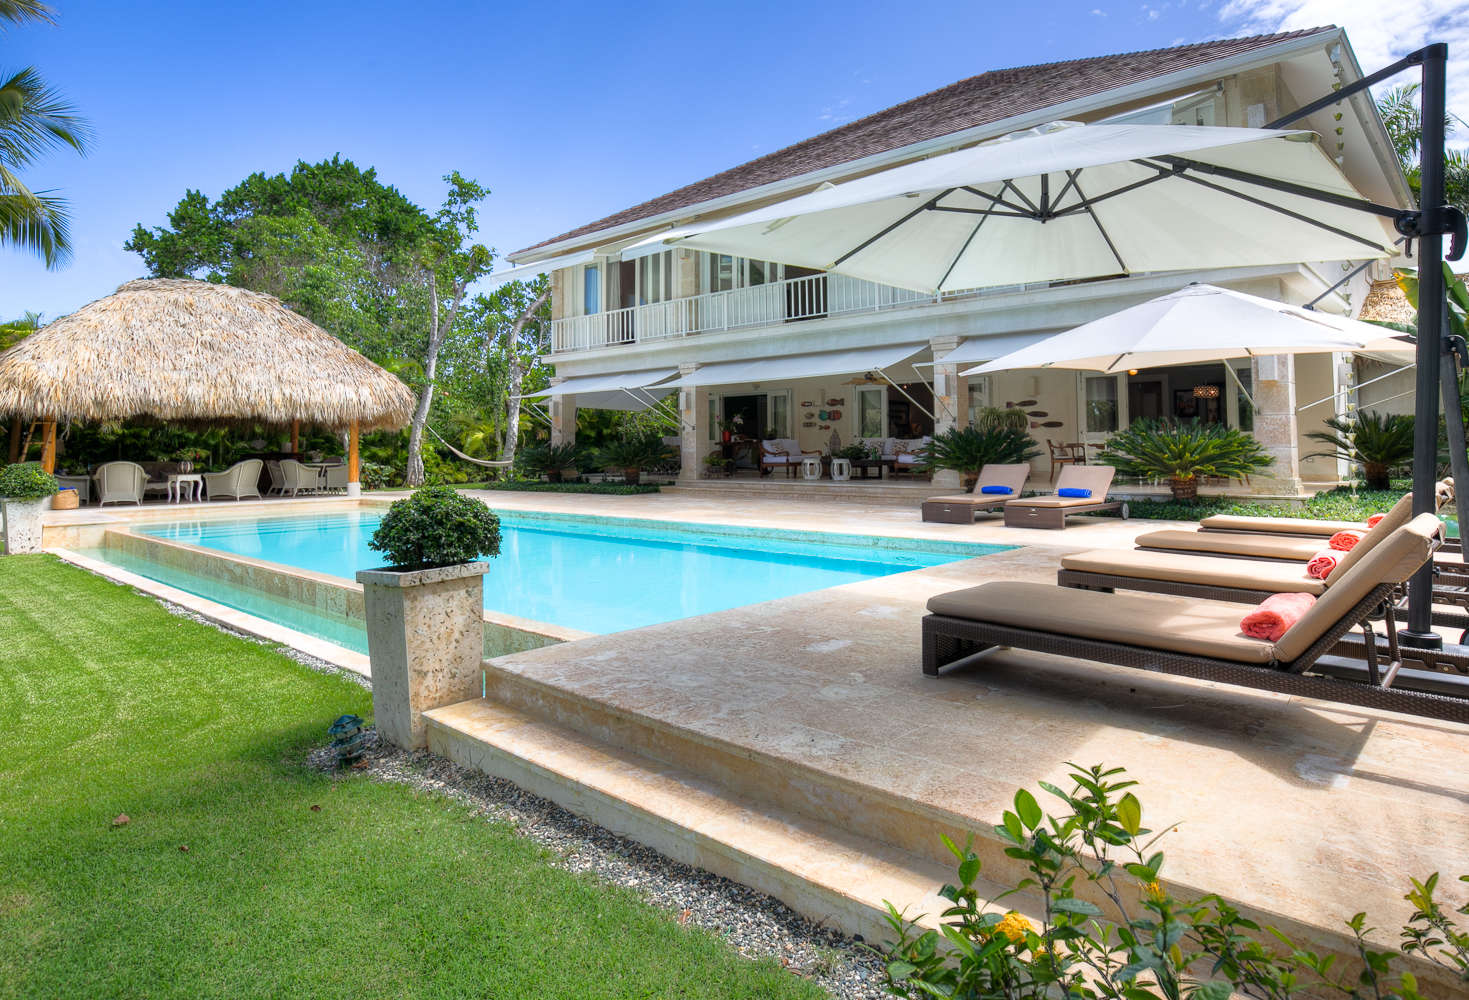 Luxury villa rentals caribbean - Dominican republic - Punta cana - Punta cana resort and club - Hacienda A13 | Buena Vida - Image 1/36